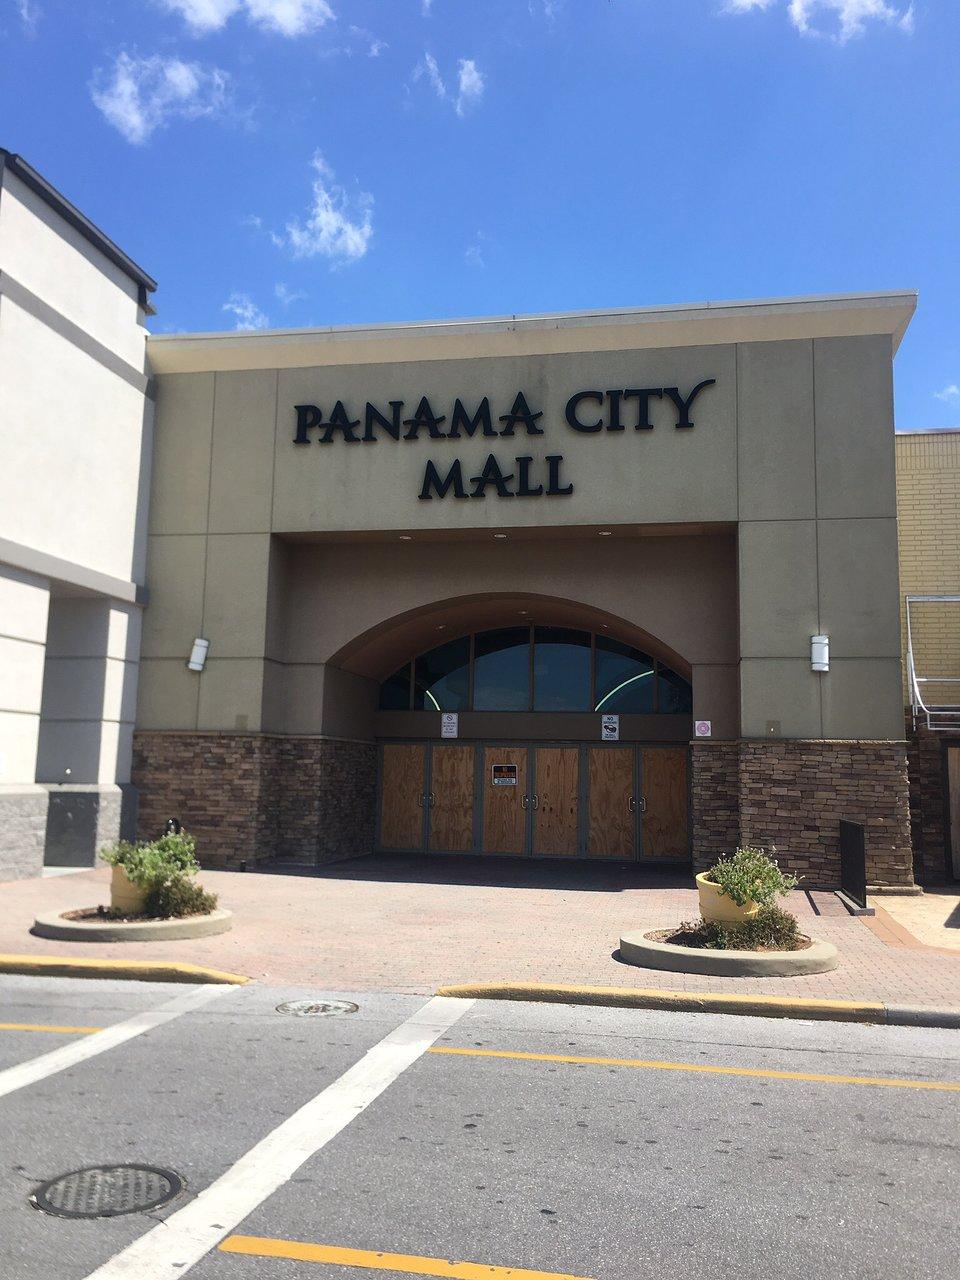 Panama City Mall 2020 All You Need To Know Before You Go With Photos Tripadvisor